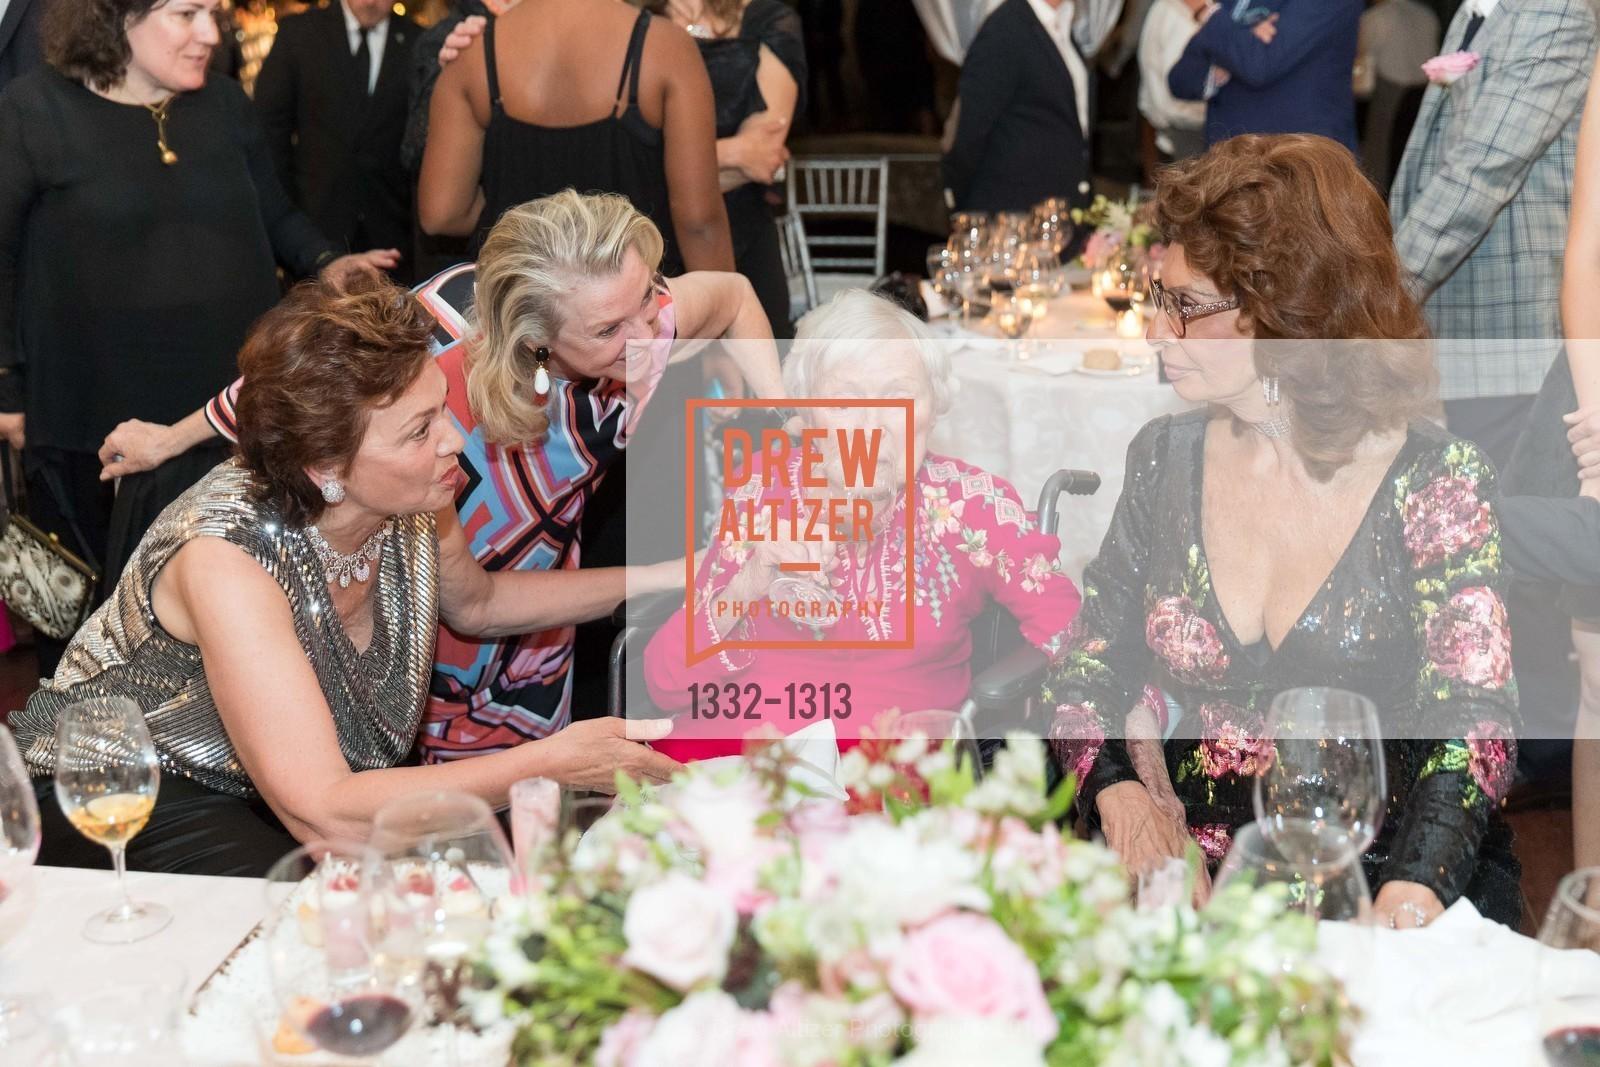 Maria Manetti Shrem, Jeanne Lawrence, Margrit Mondavi, Sophia Loren, Festival Napa Valley Tribute to Margrit Mondavi at Far Niente, Far Niente Winery. 1350 Acacia Dr, July 23rd, 2016